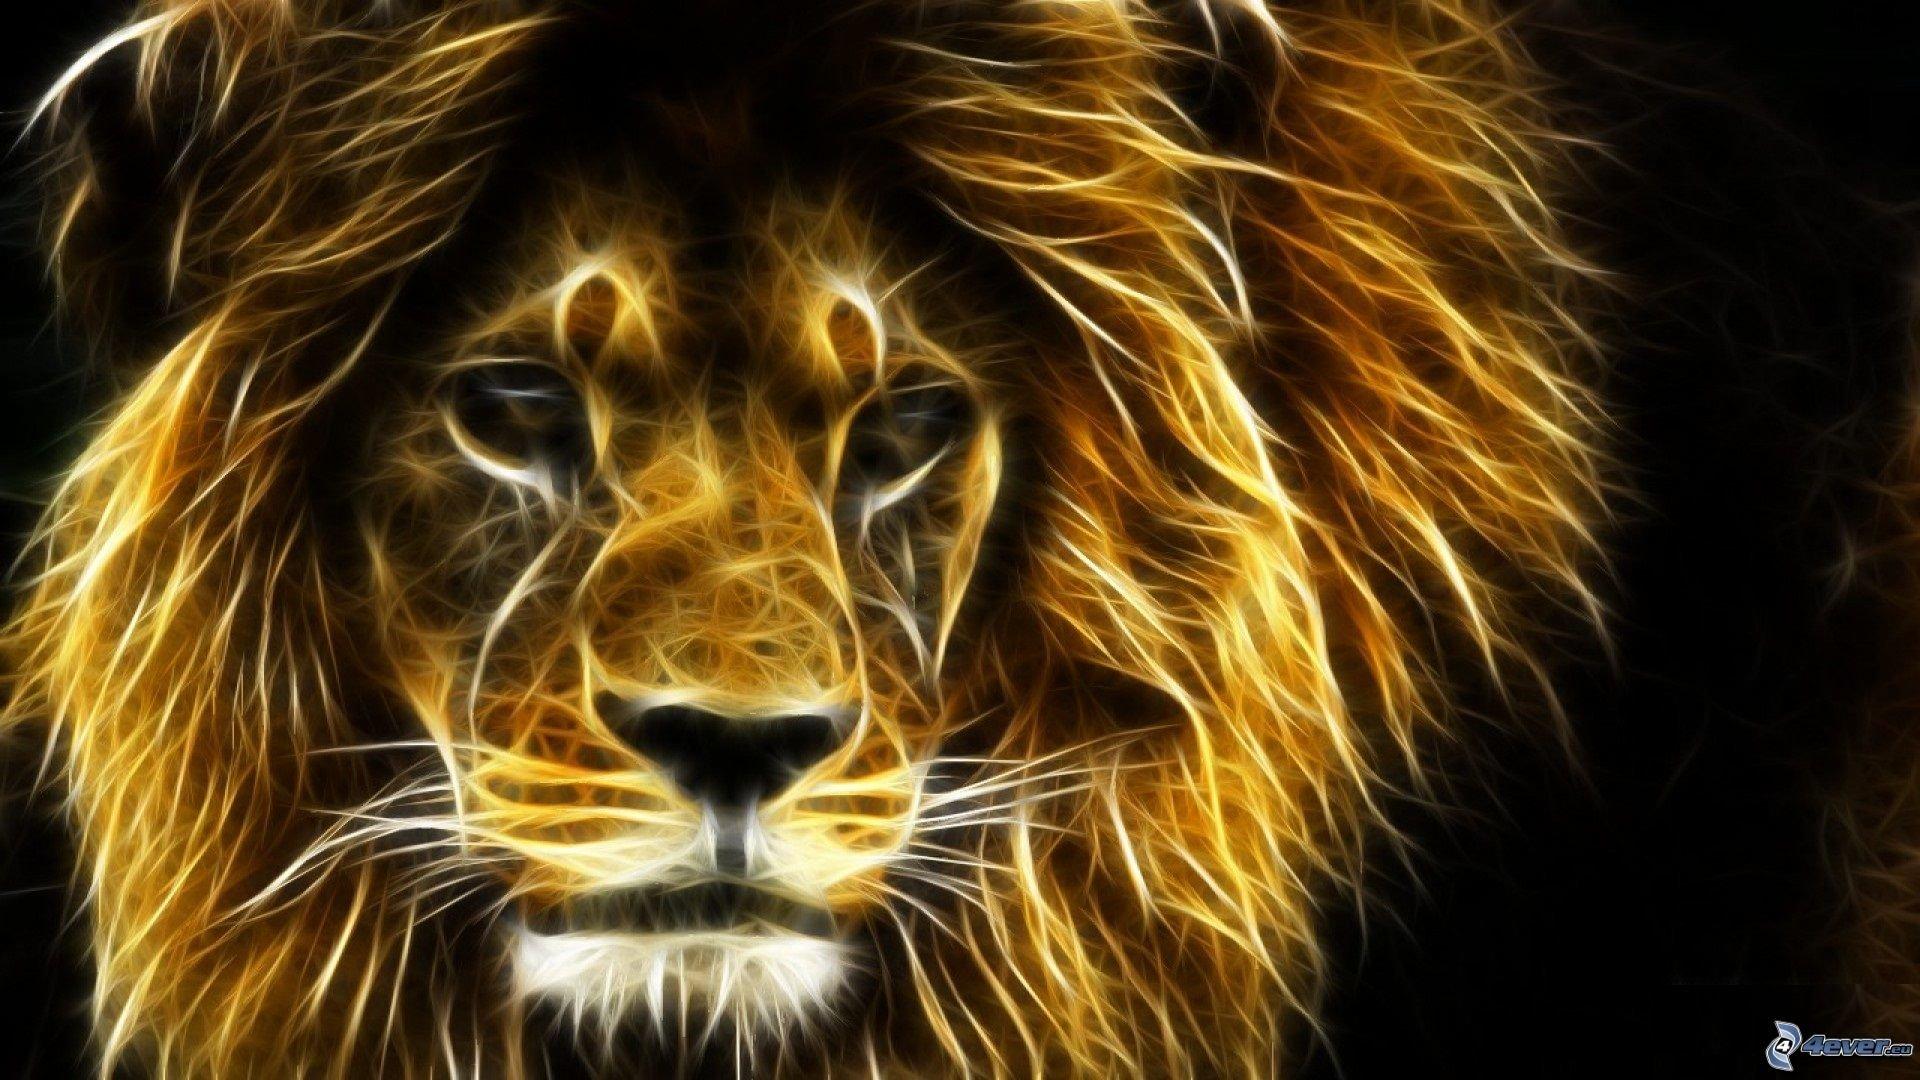 free lion high quality wallpaper id:256000 for full hd 1080p desktop